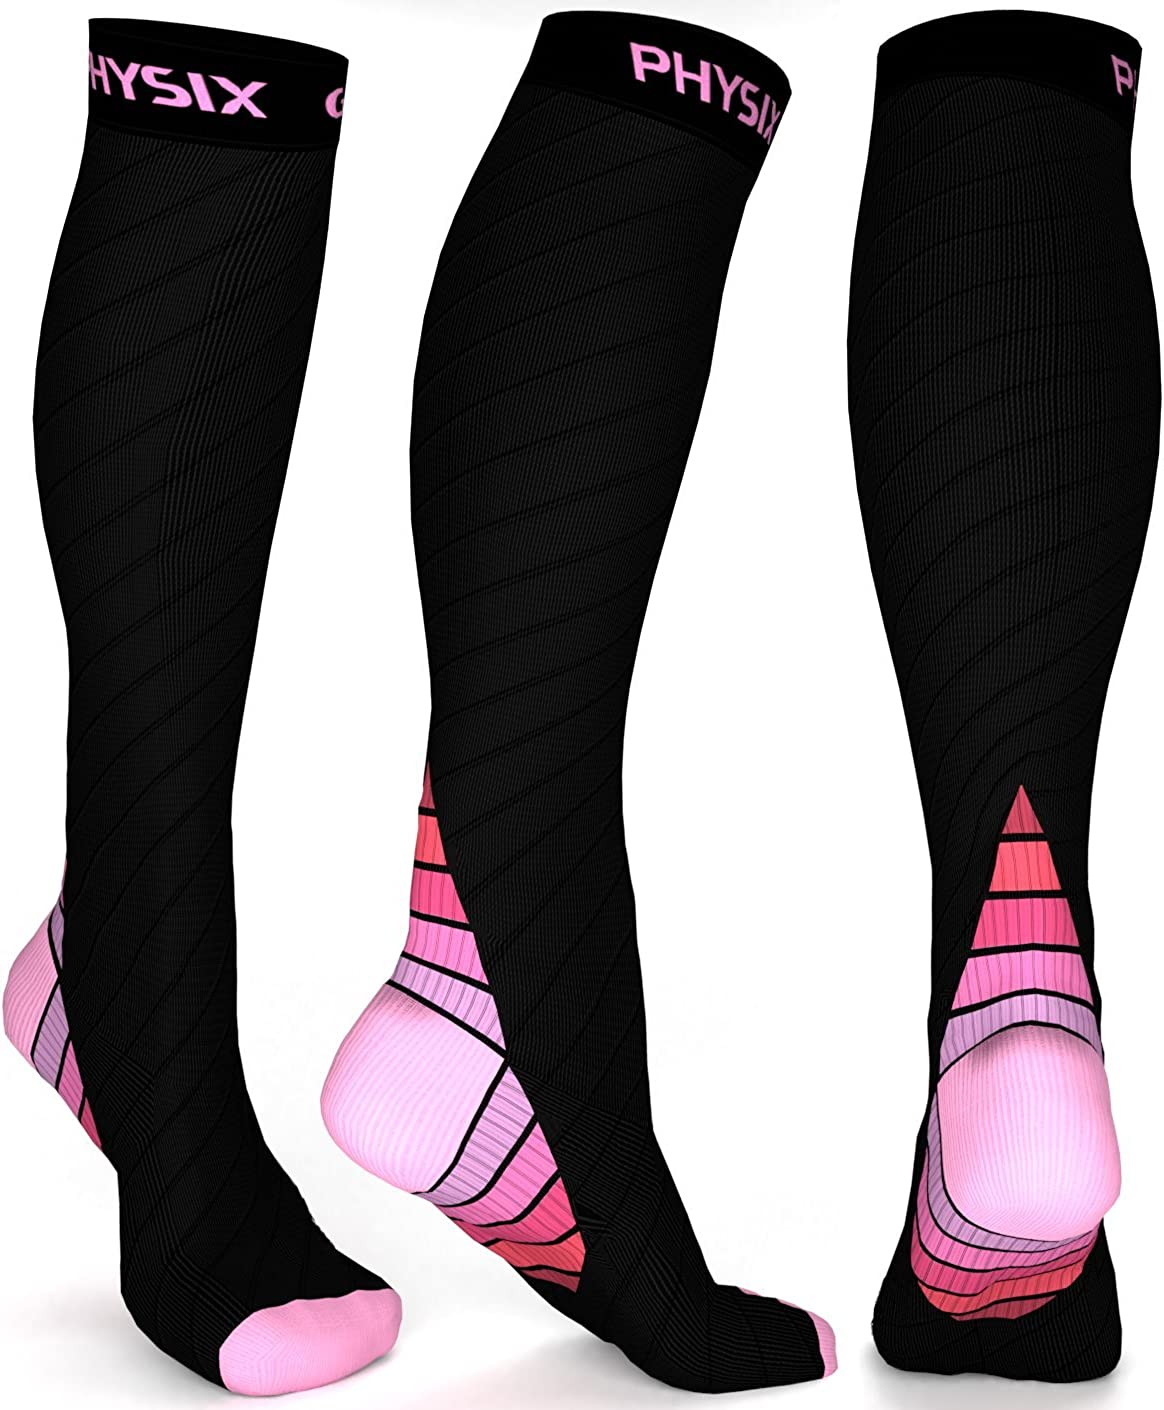 Physix Gear Compression Socks for Men /& Women 20-30 mmhg Best Graduated Athletic Fit for Running Nurses Shin Splints Flight Travel /& Maternity Pregnancy Boost Stamina Circulation /& Recovery PNK XXL